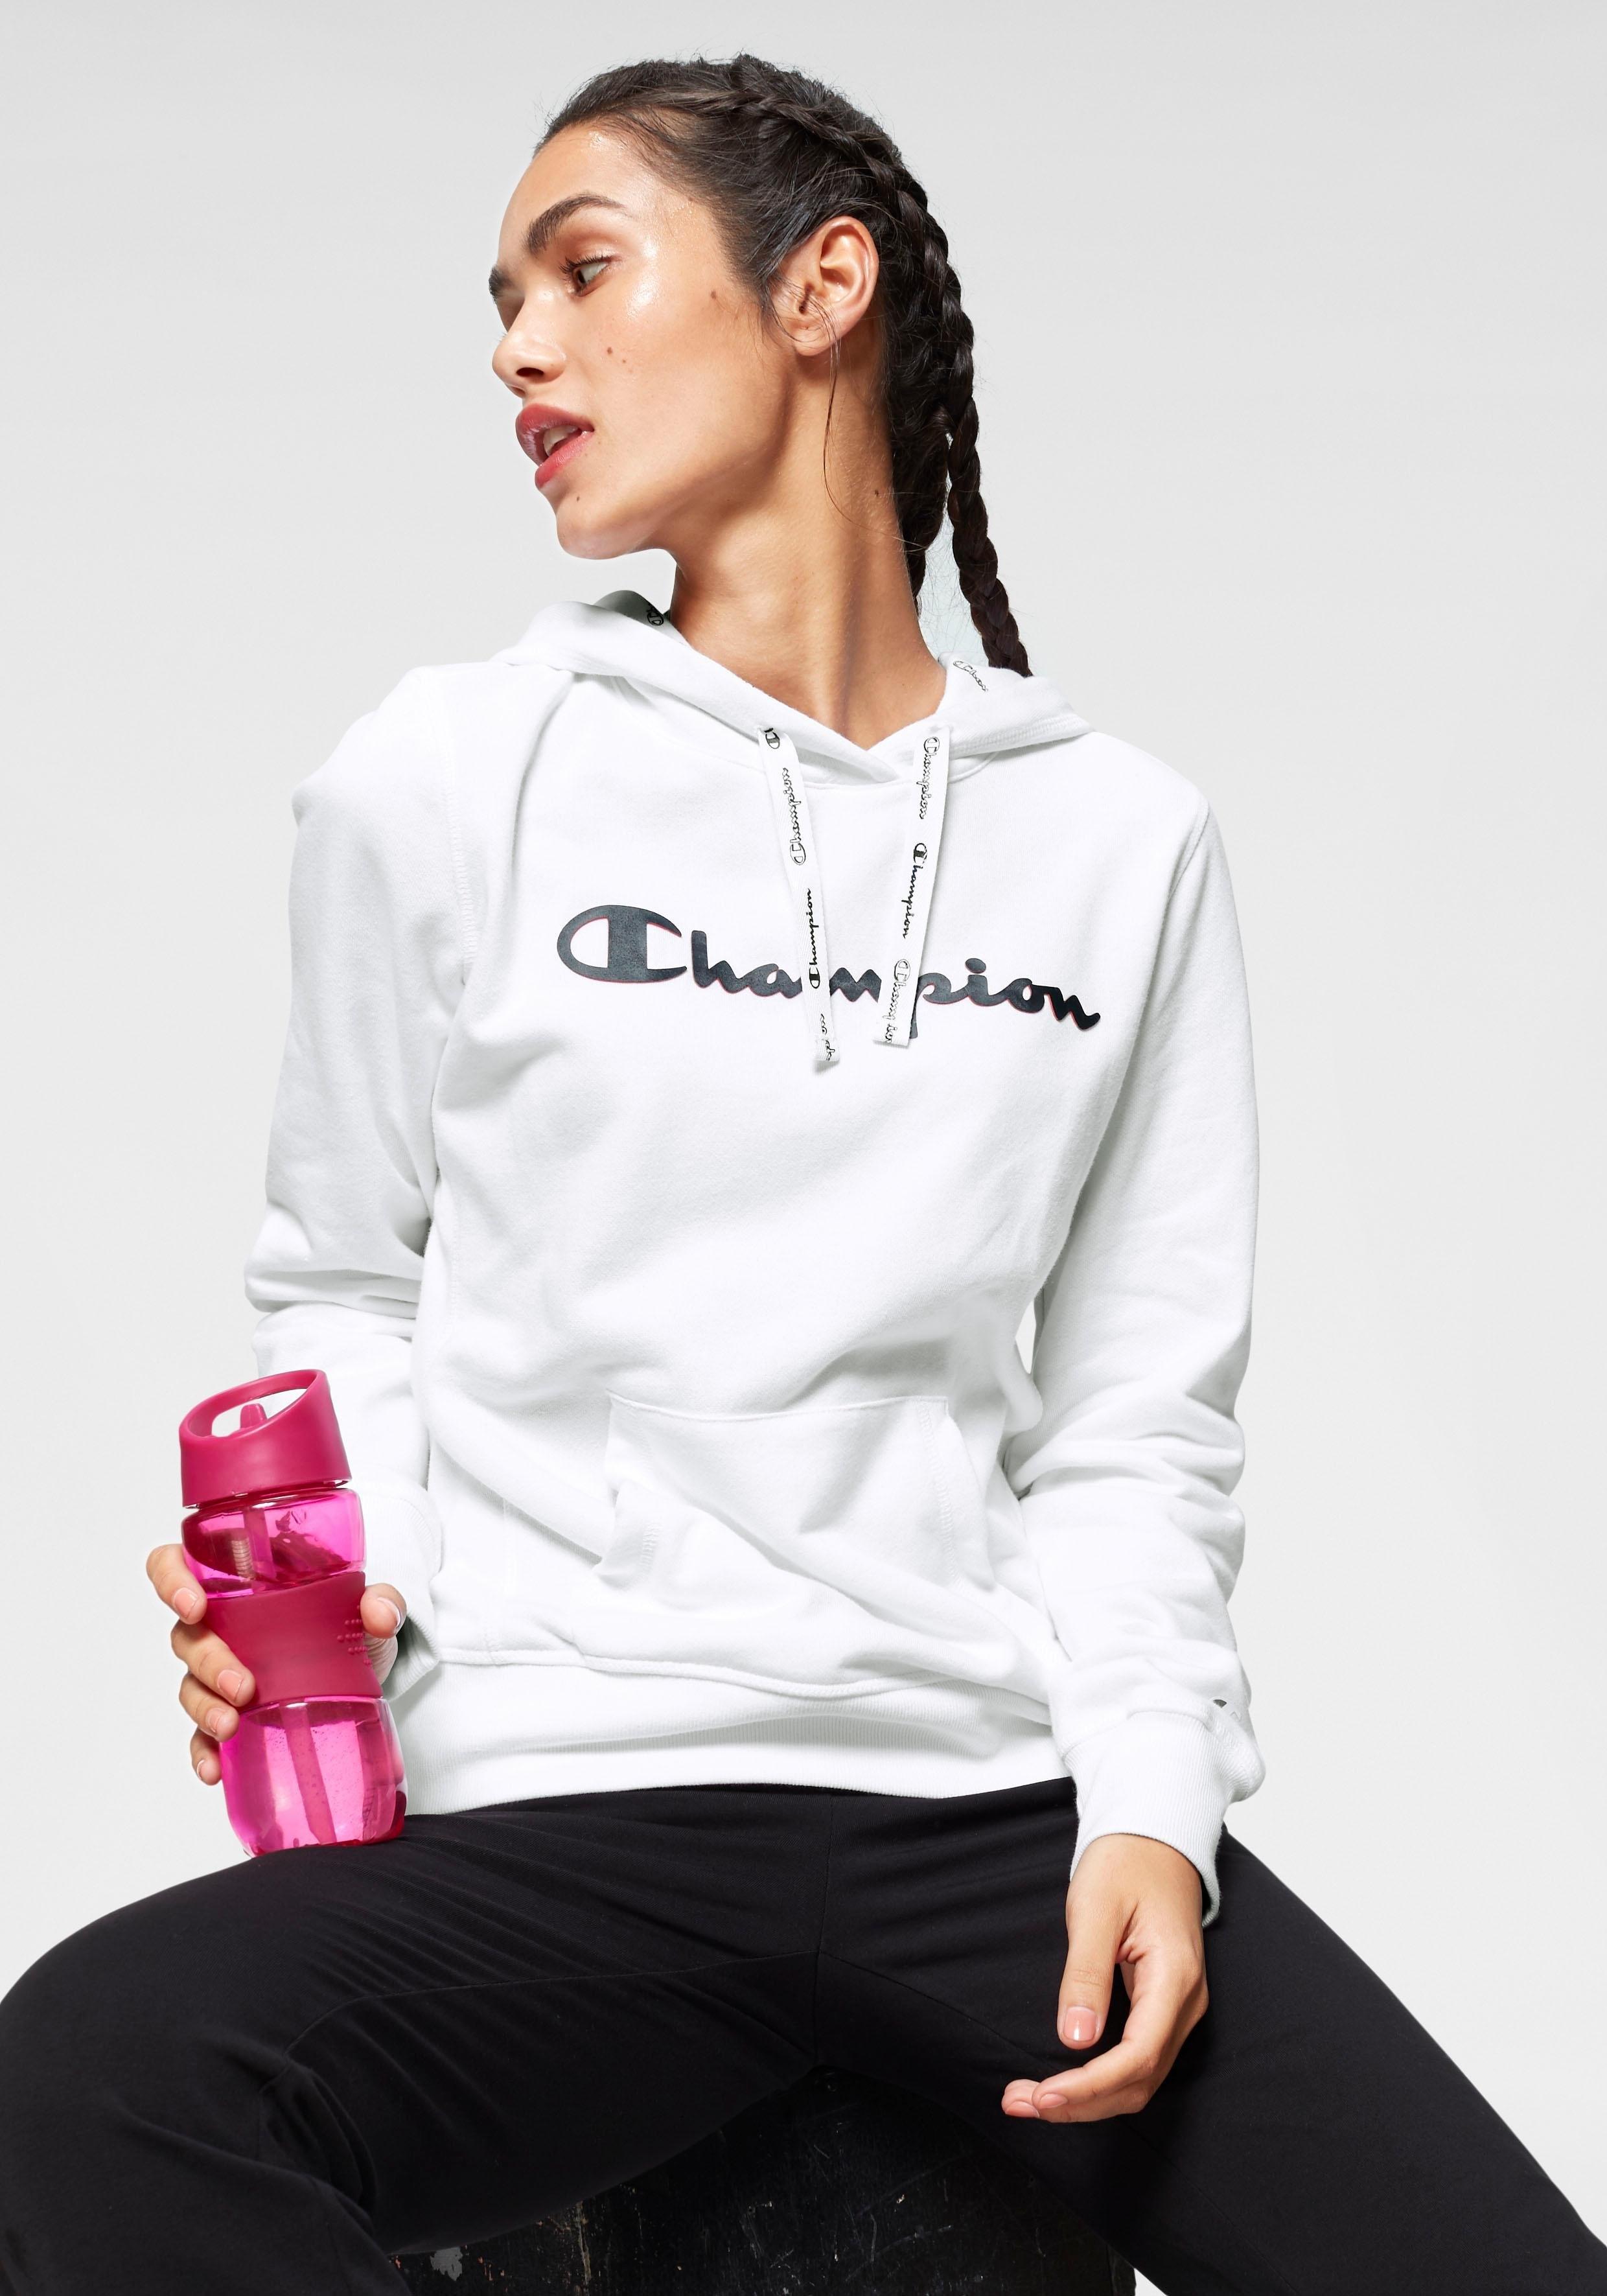 Nu Champion Hoodiehooded Online Sweatshirt Bestellen AR54jL